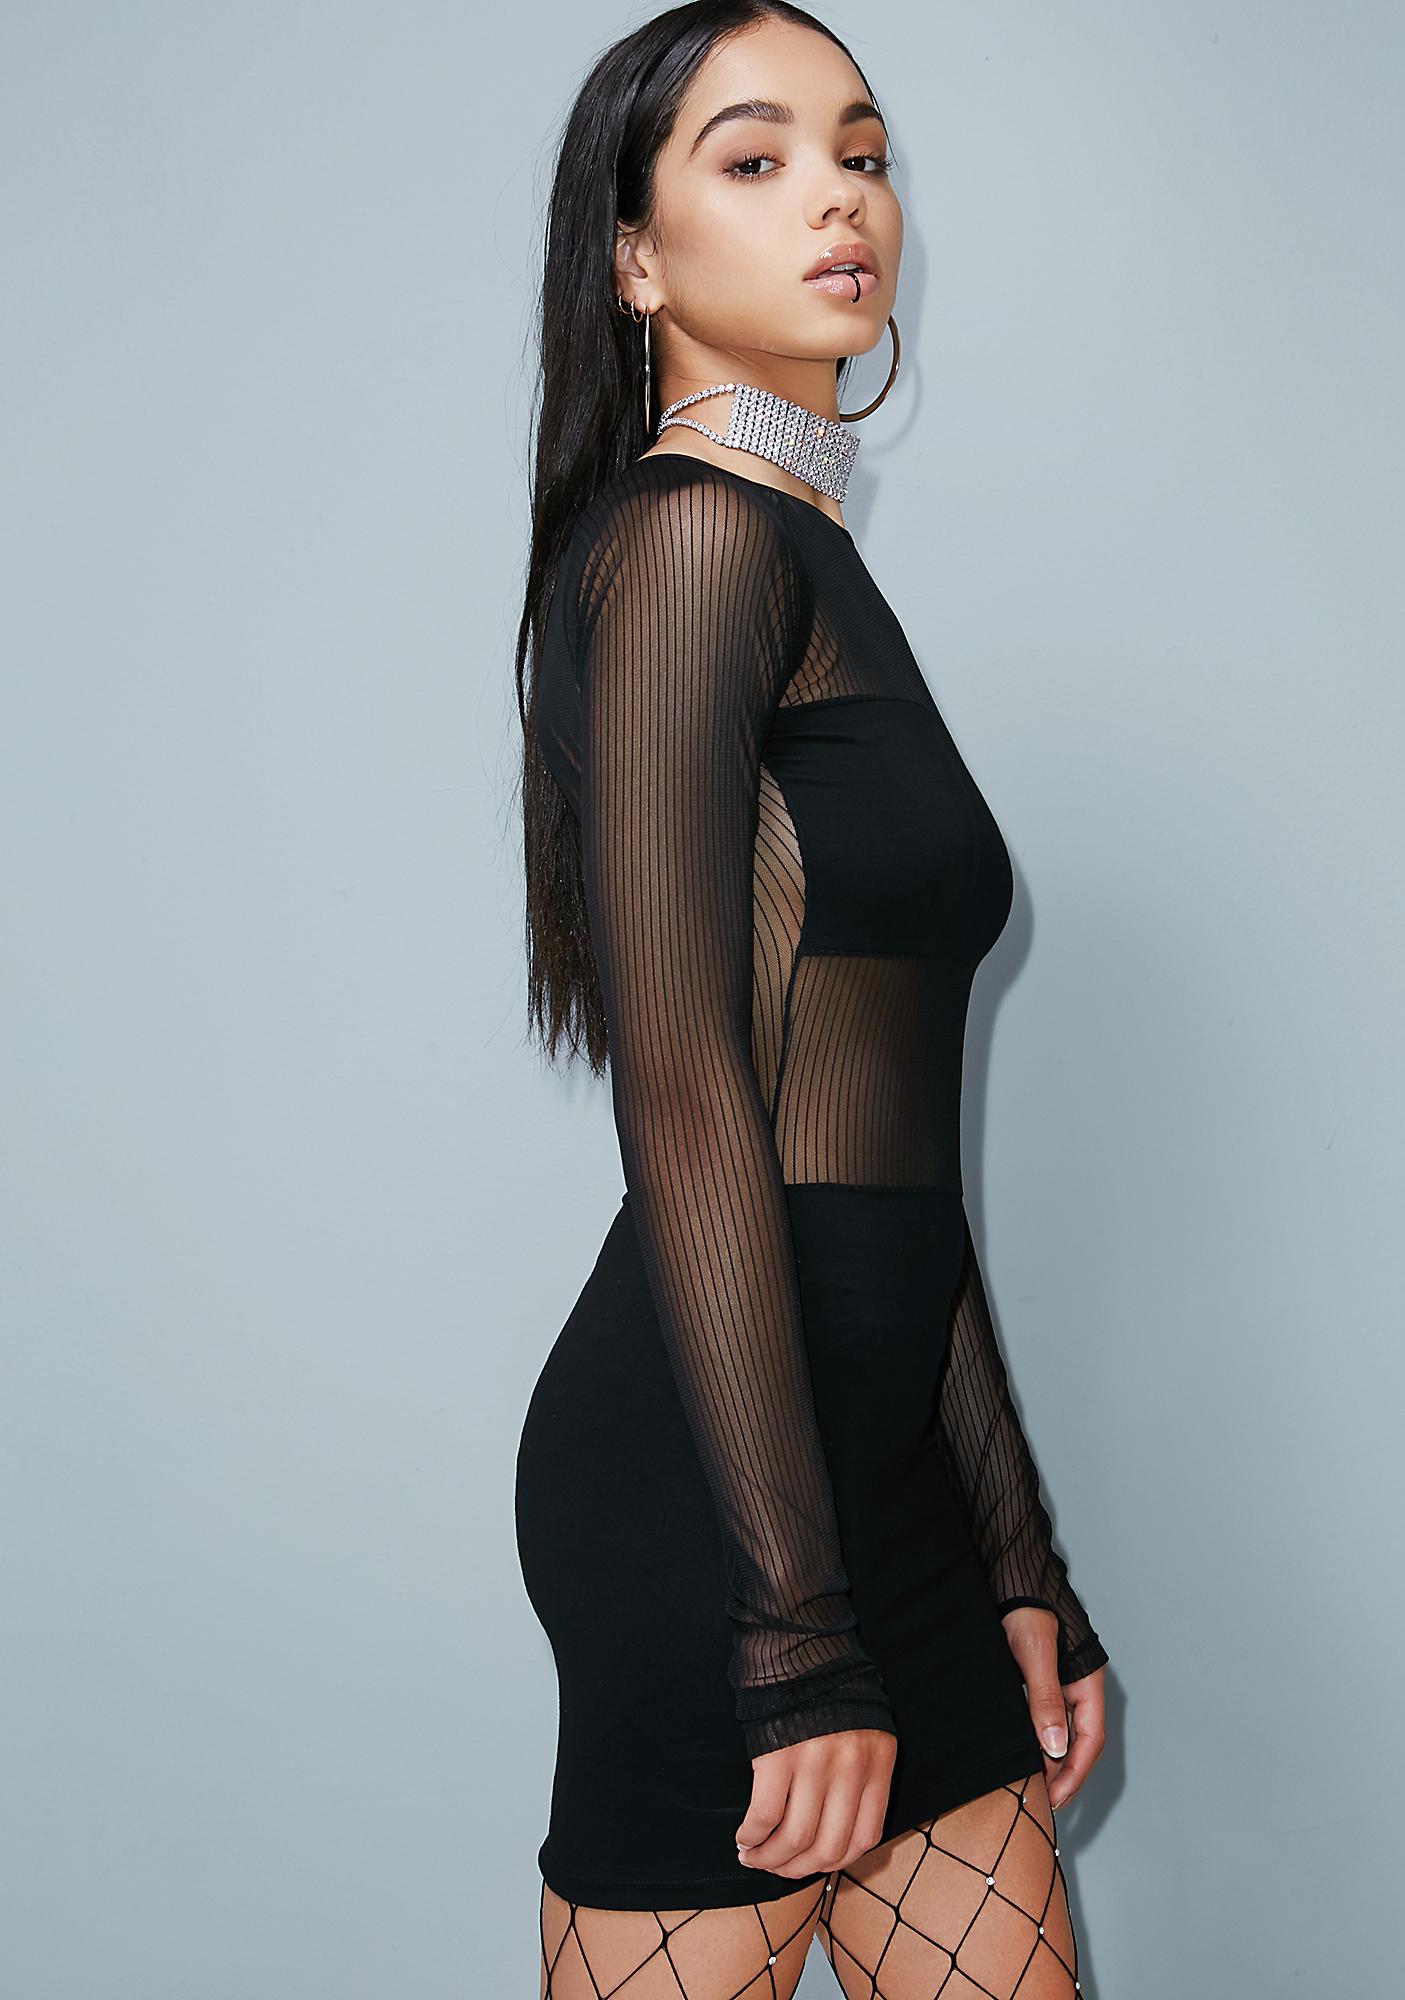 Poster Grl Clothing - I Want It Black